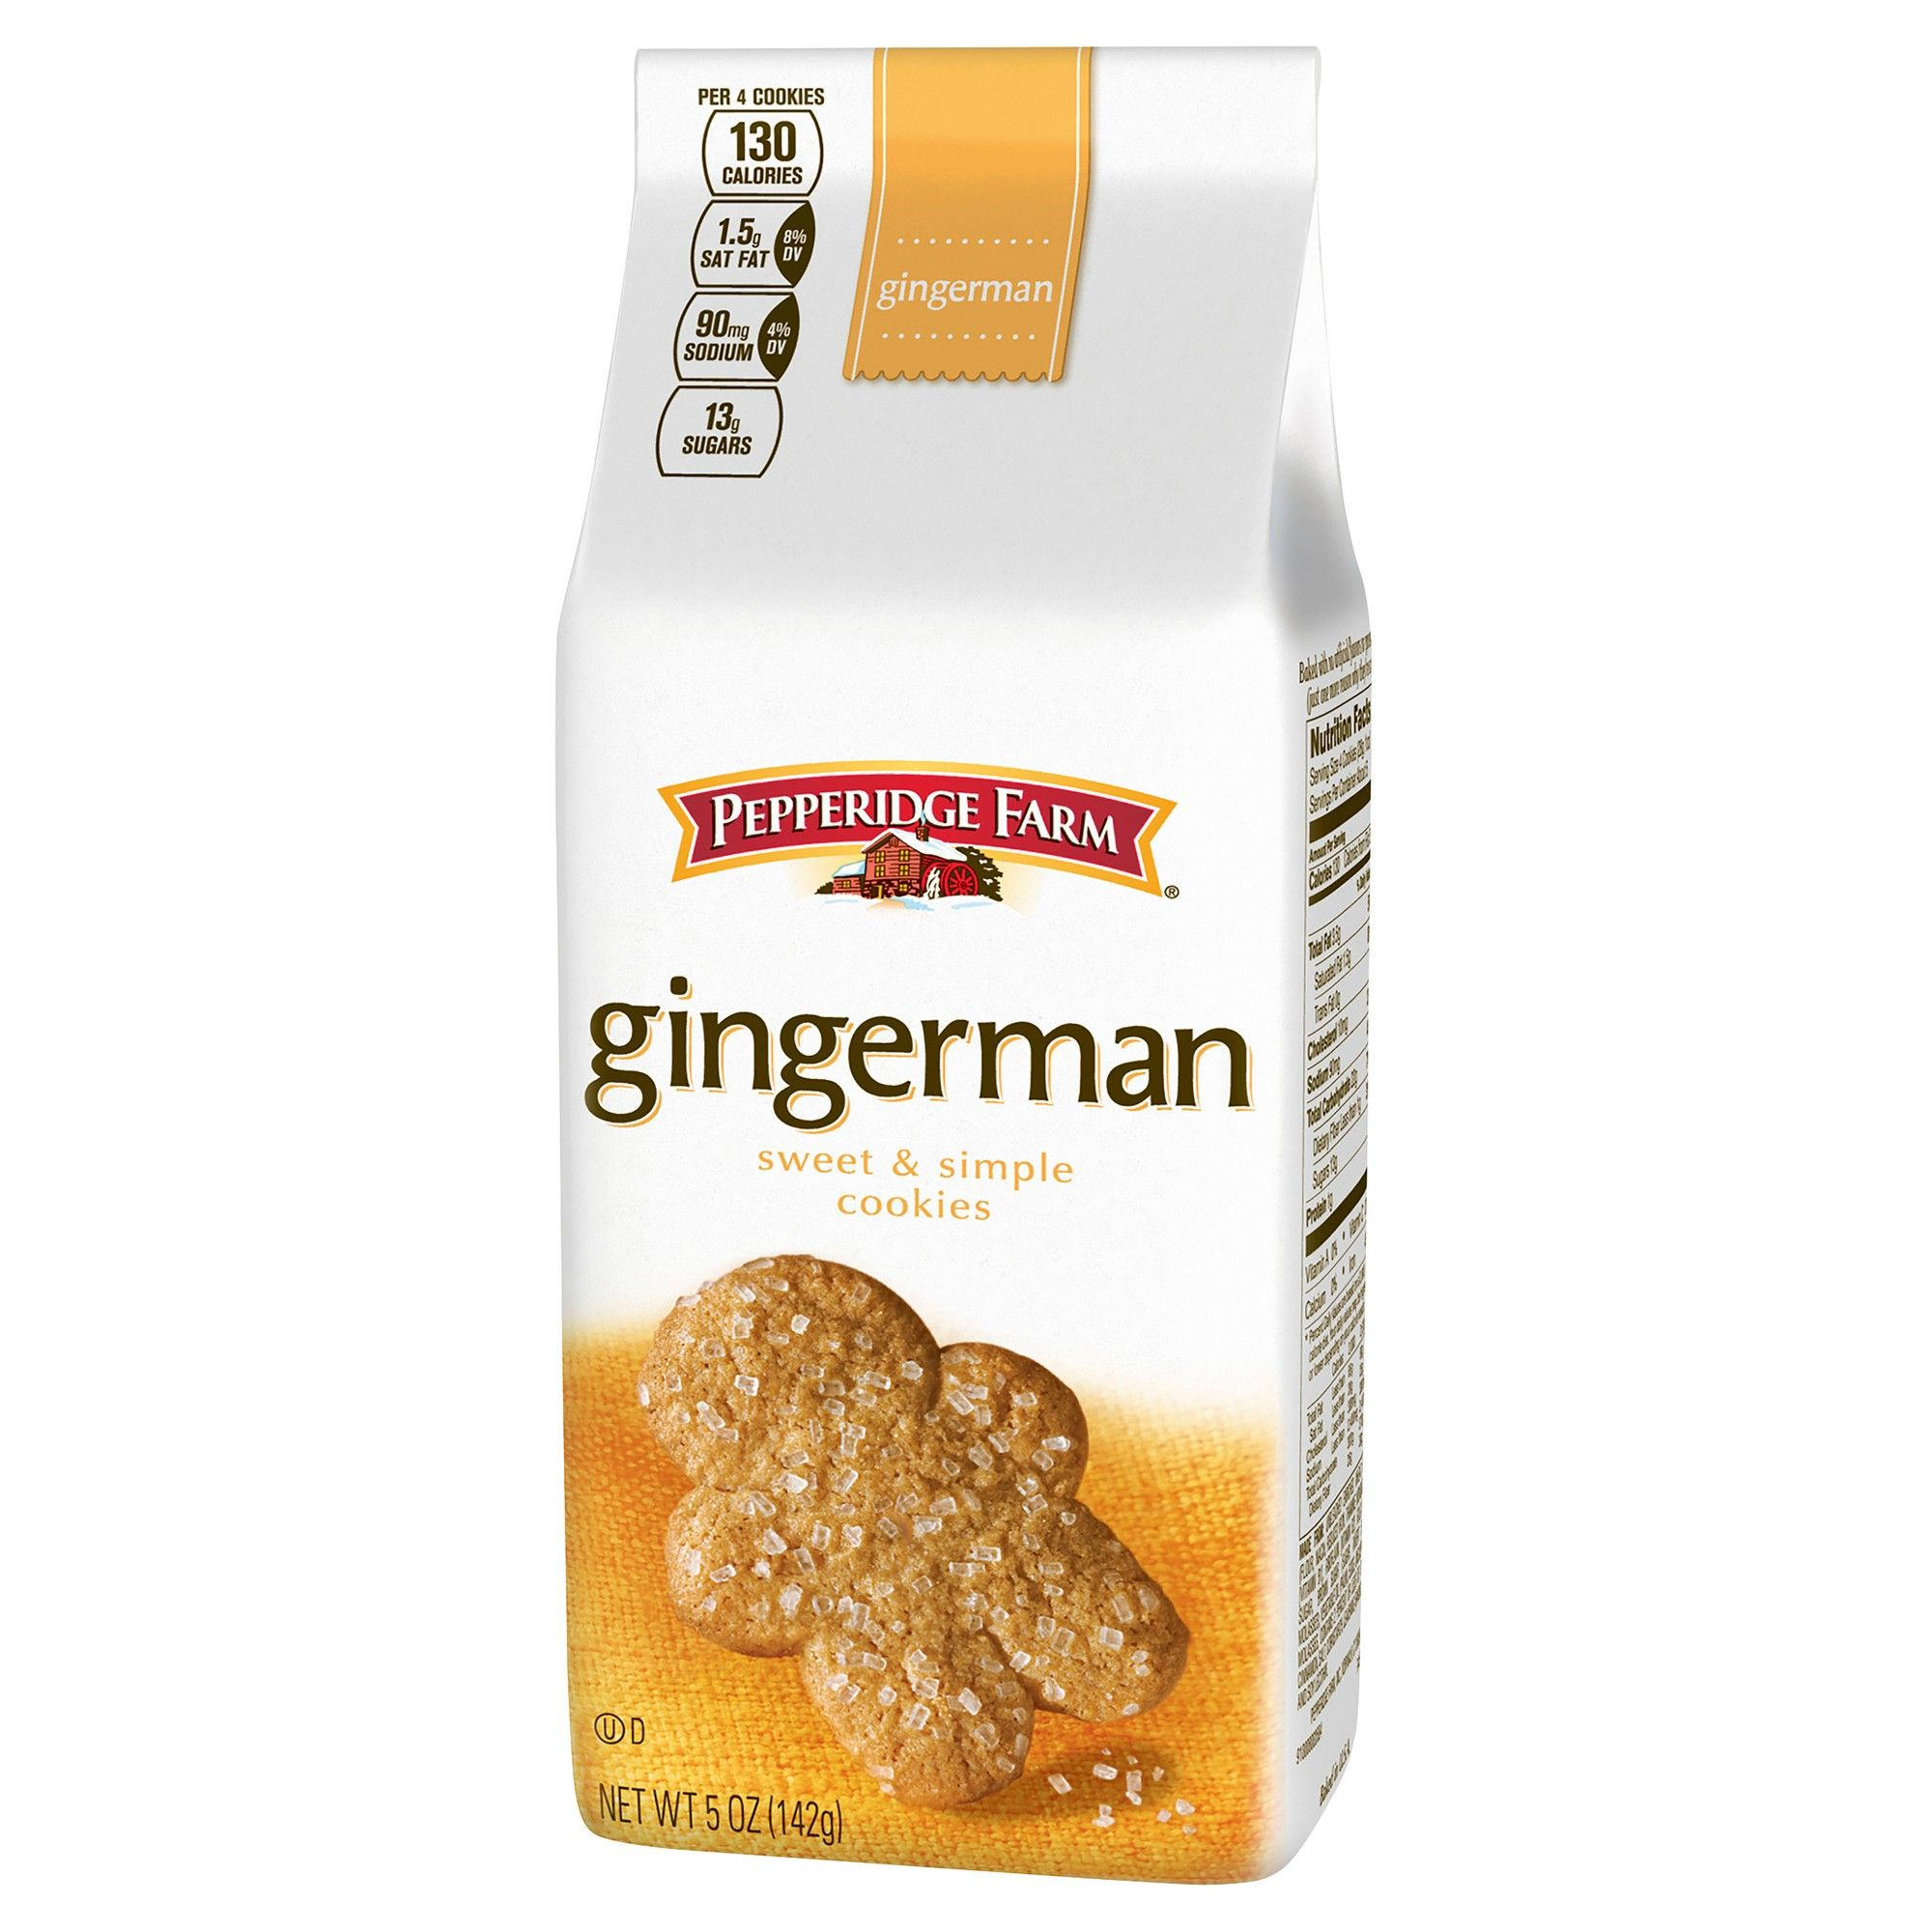 Pepperidge Farm Gingerman Cookies 5oz Pepperidge farm